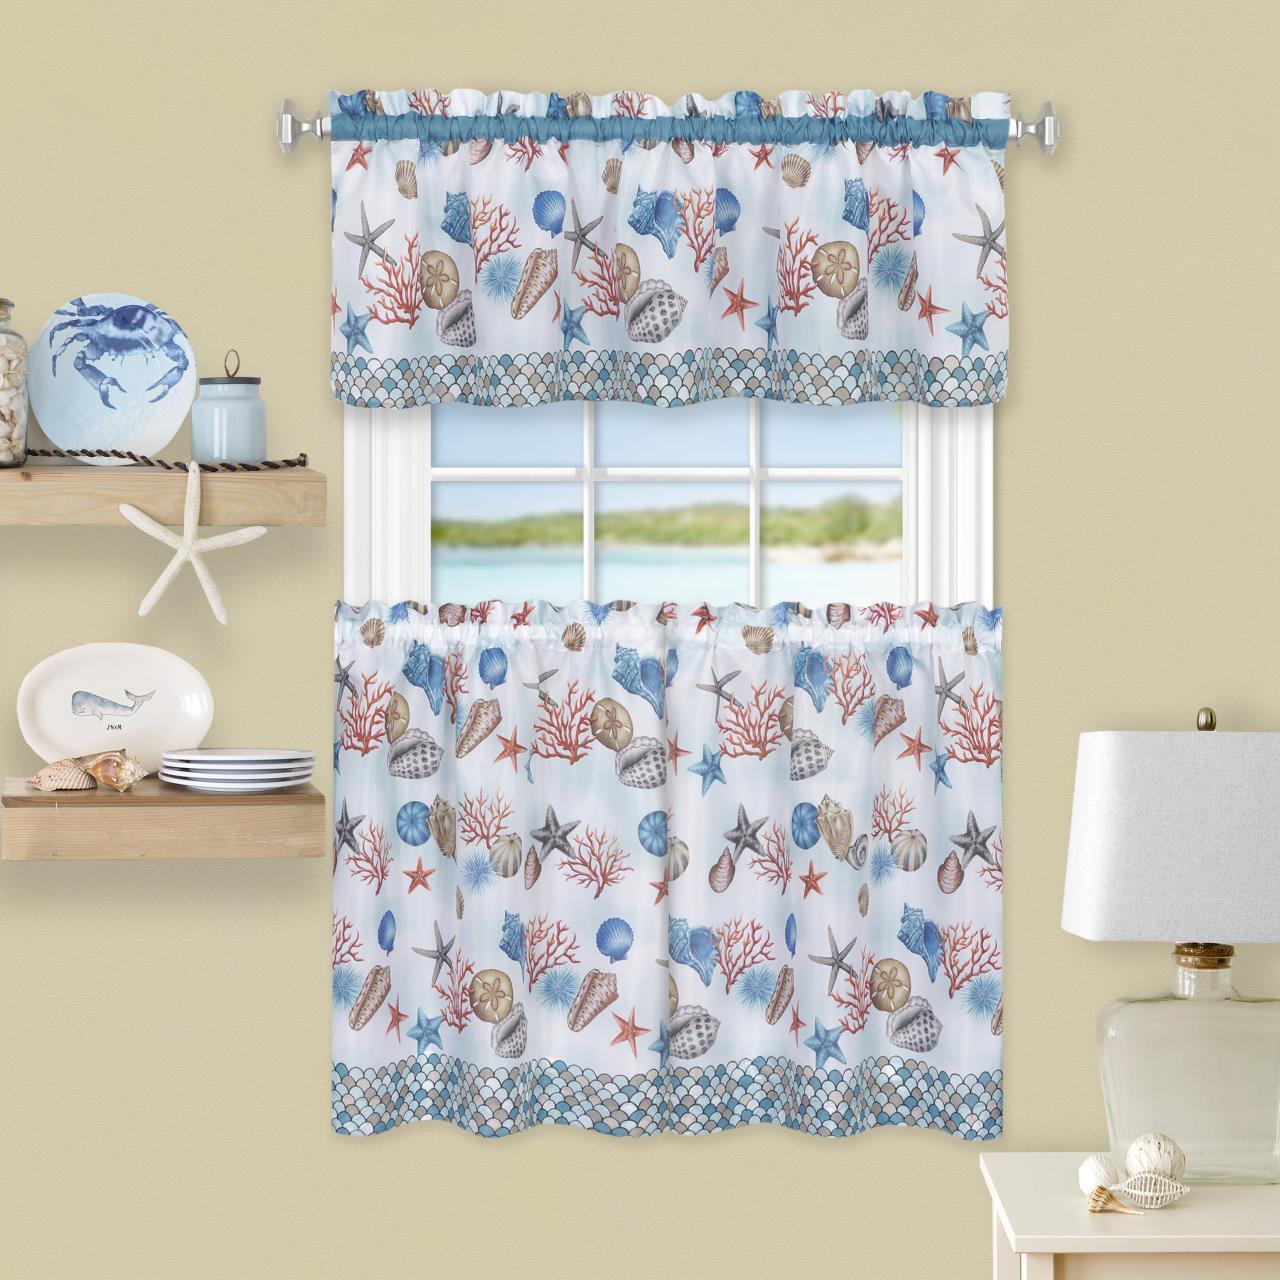 Coastal Tier Curtain Set - 054006252628